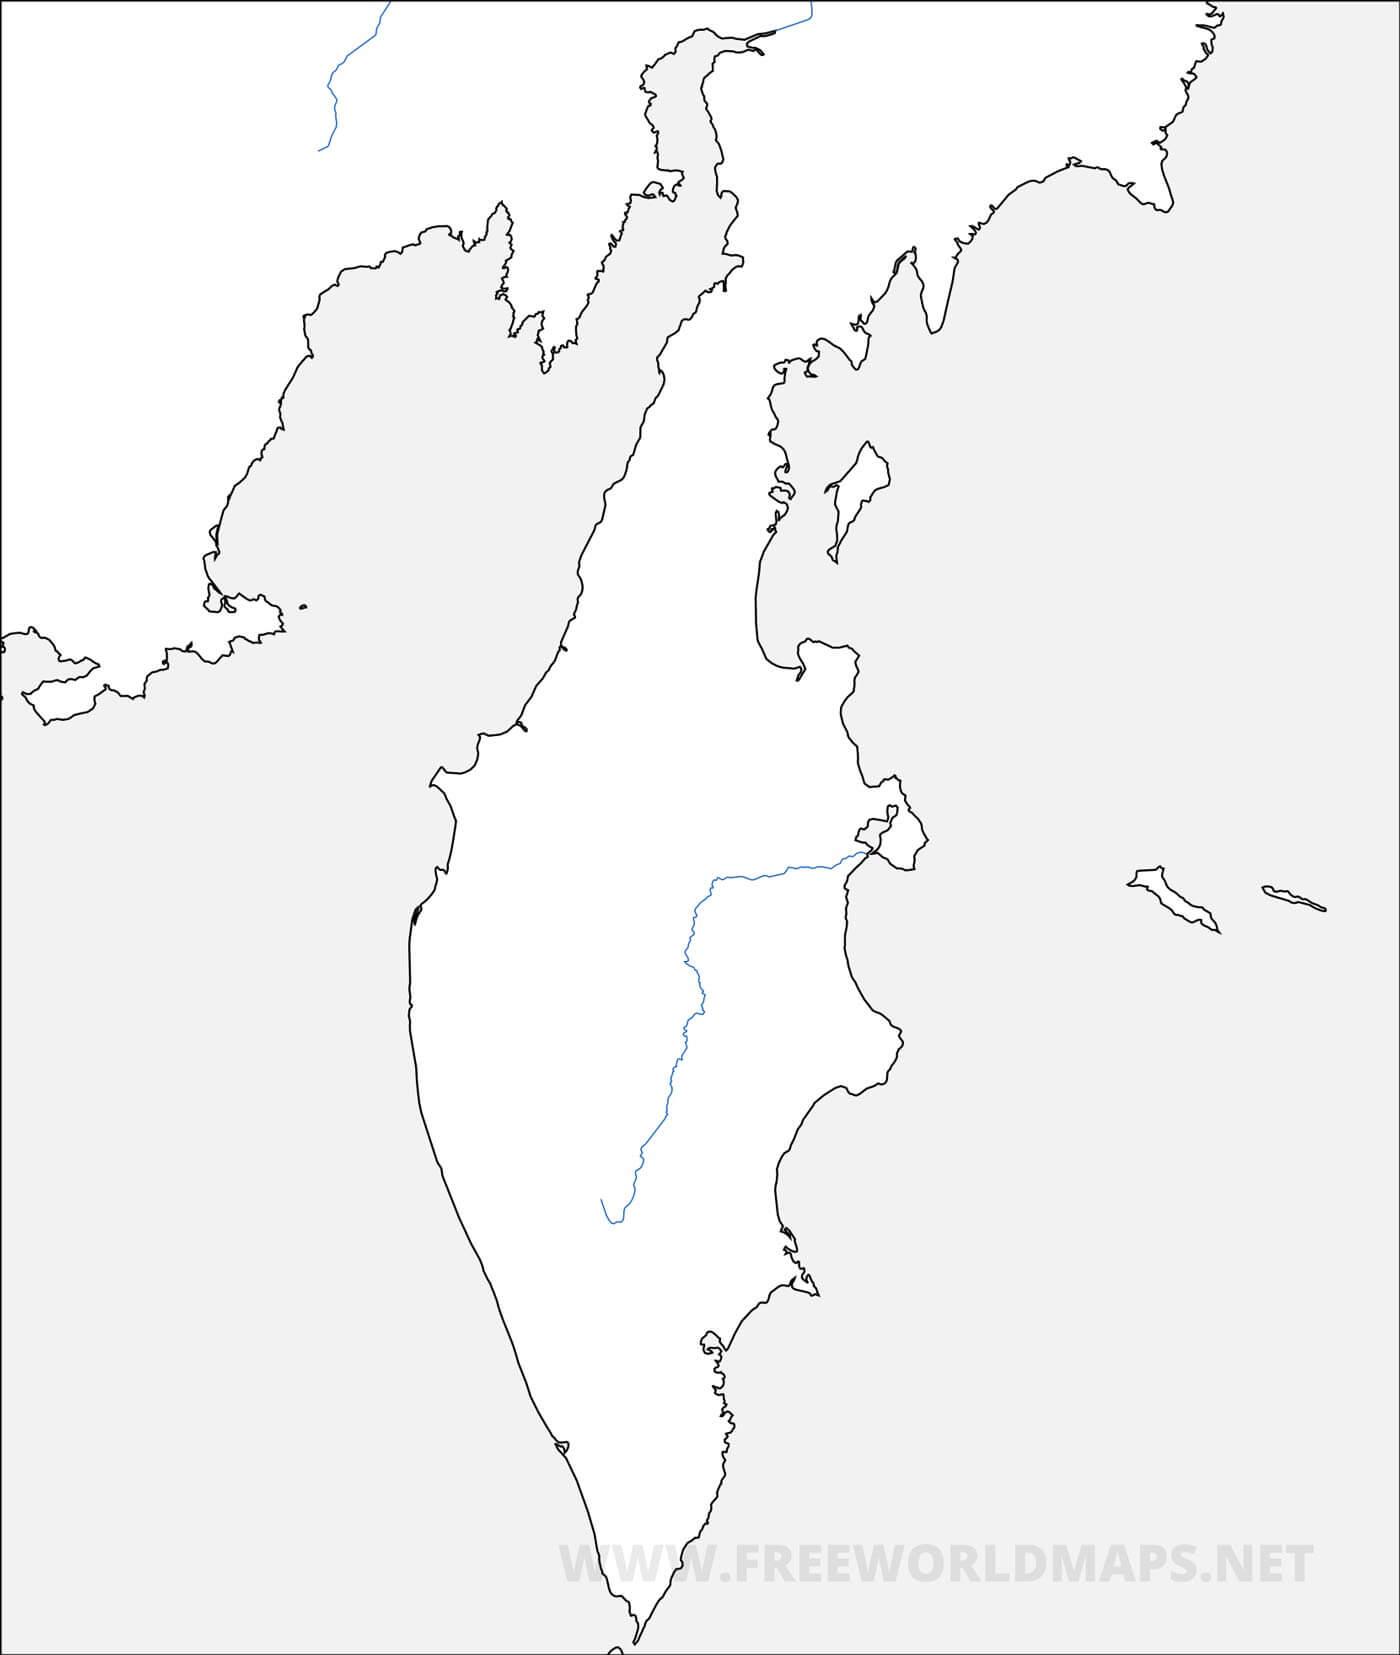 Kamchatka Maps on volga river map, novaya zemlya map, kolyma river map, kola peninsula, volgograd map, white sea map, north equatorial map, sea of okhotsk map, sea of okhotsk, russia map, lake baikal, mainland asia map, saint petersburg, bougainville trench map, don river, bering strait, chukchi peninsula map, west siberian plain, kuril islands, caucasus map, the antarctic circle map, iceland map, russian far east, bering sea map, aral sea map, ob river map, kunashir island map, lake baikal map, klyuchevskaya sopka, malay peninsula map, aleutian islands,